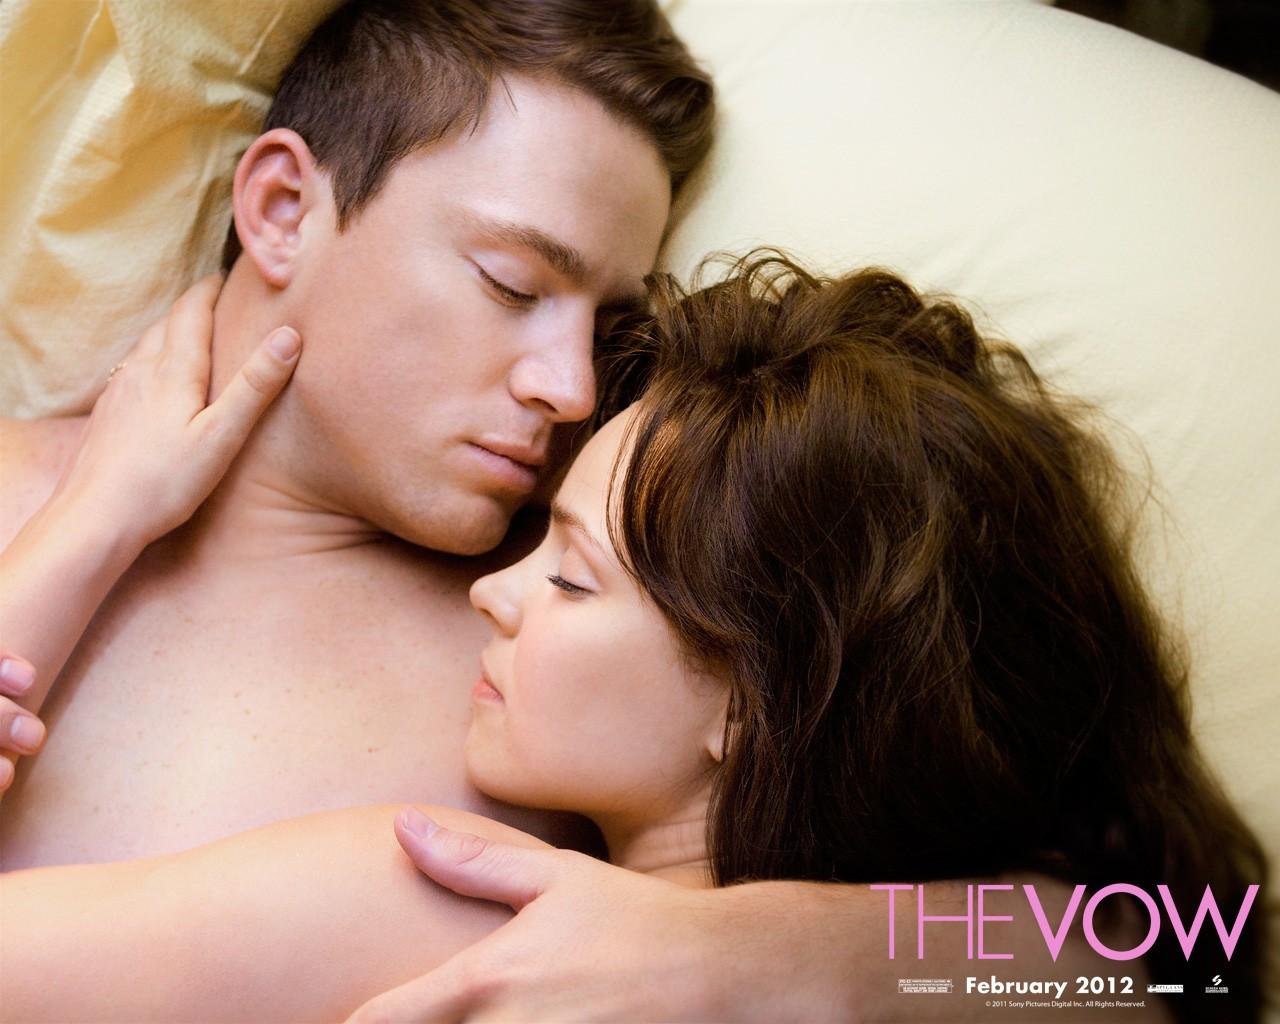 Channing Tatum insieme a Rachel McAdams in uno degli wallpaper di The Vow